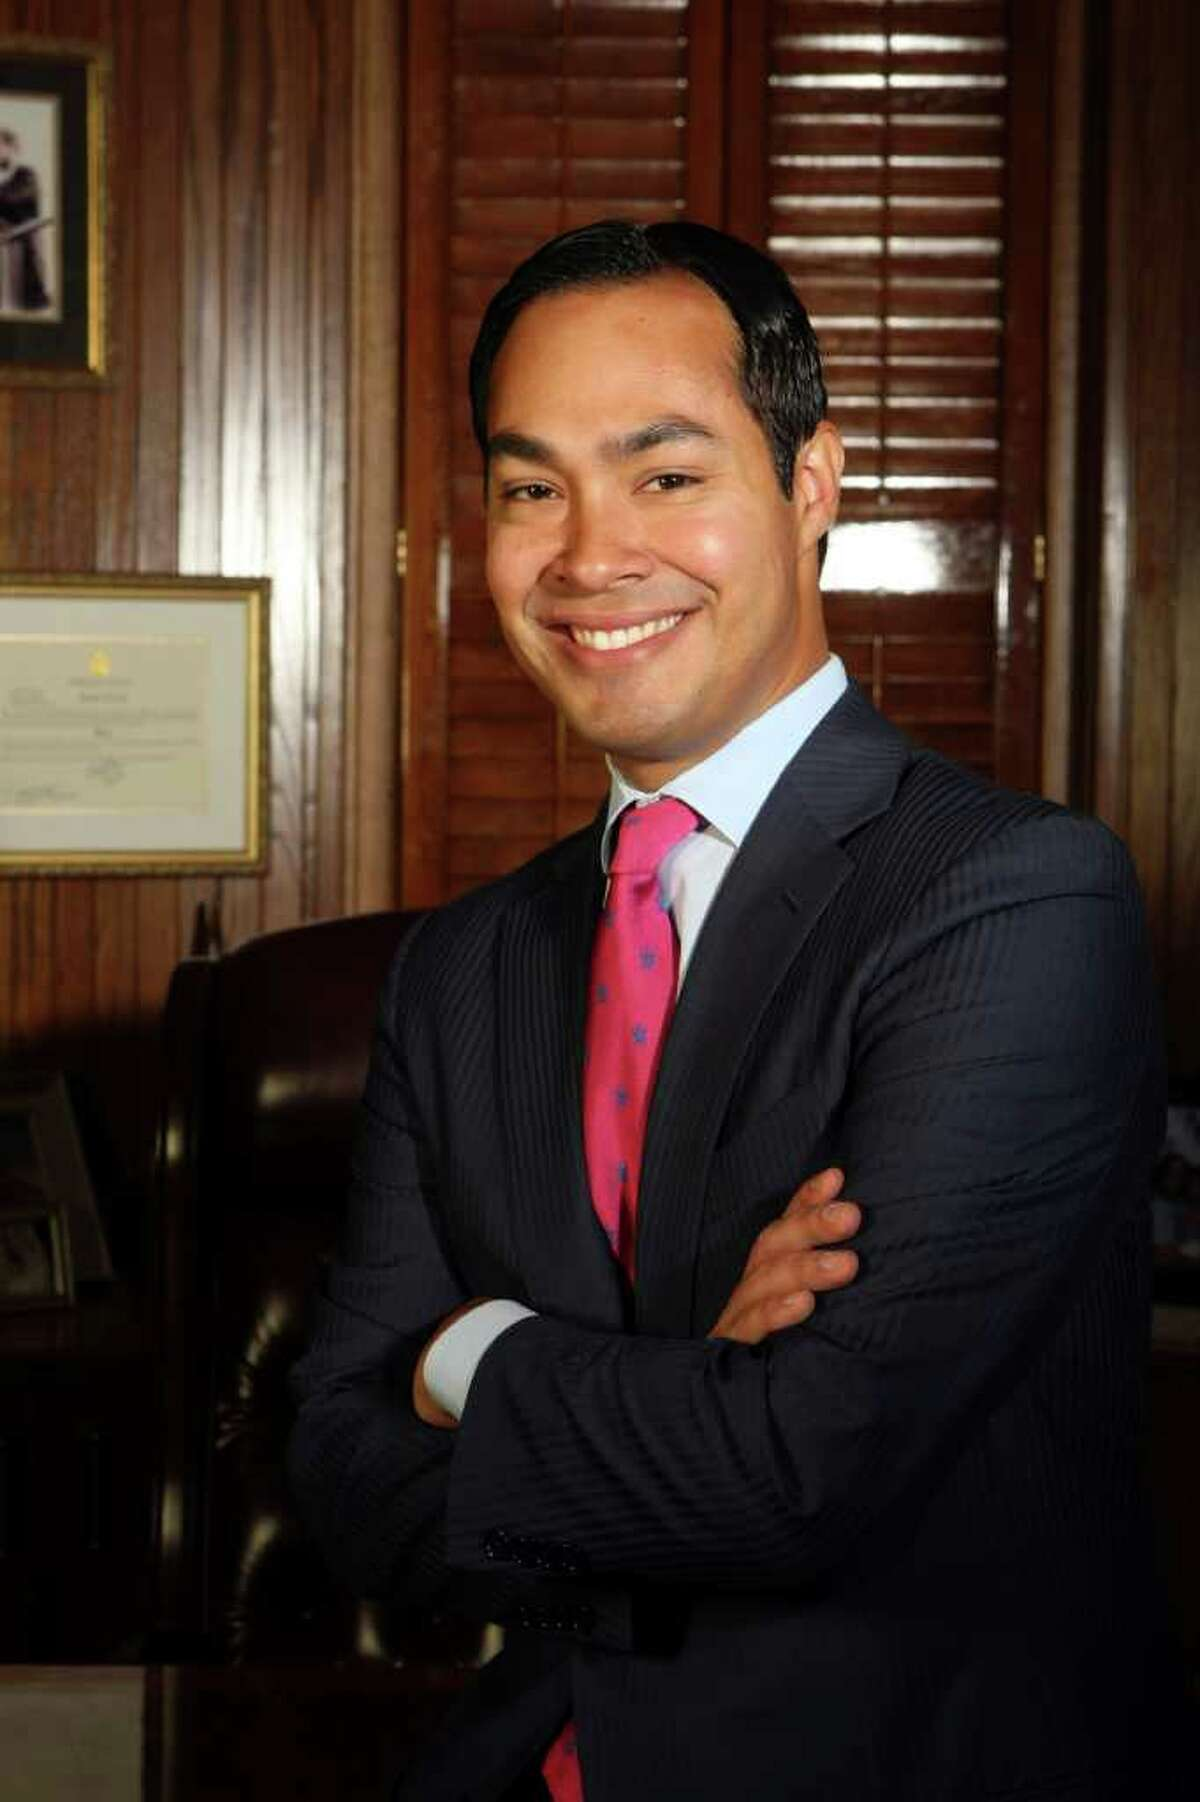 Mayor Julián Castro: President Barack Obama and San Antonio share an economic and educational vision.